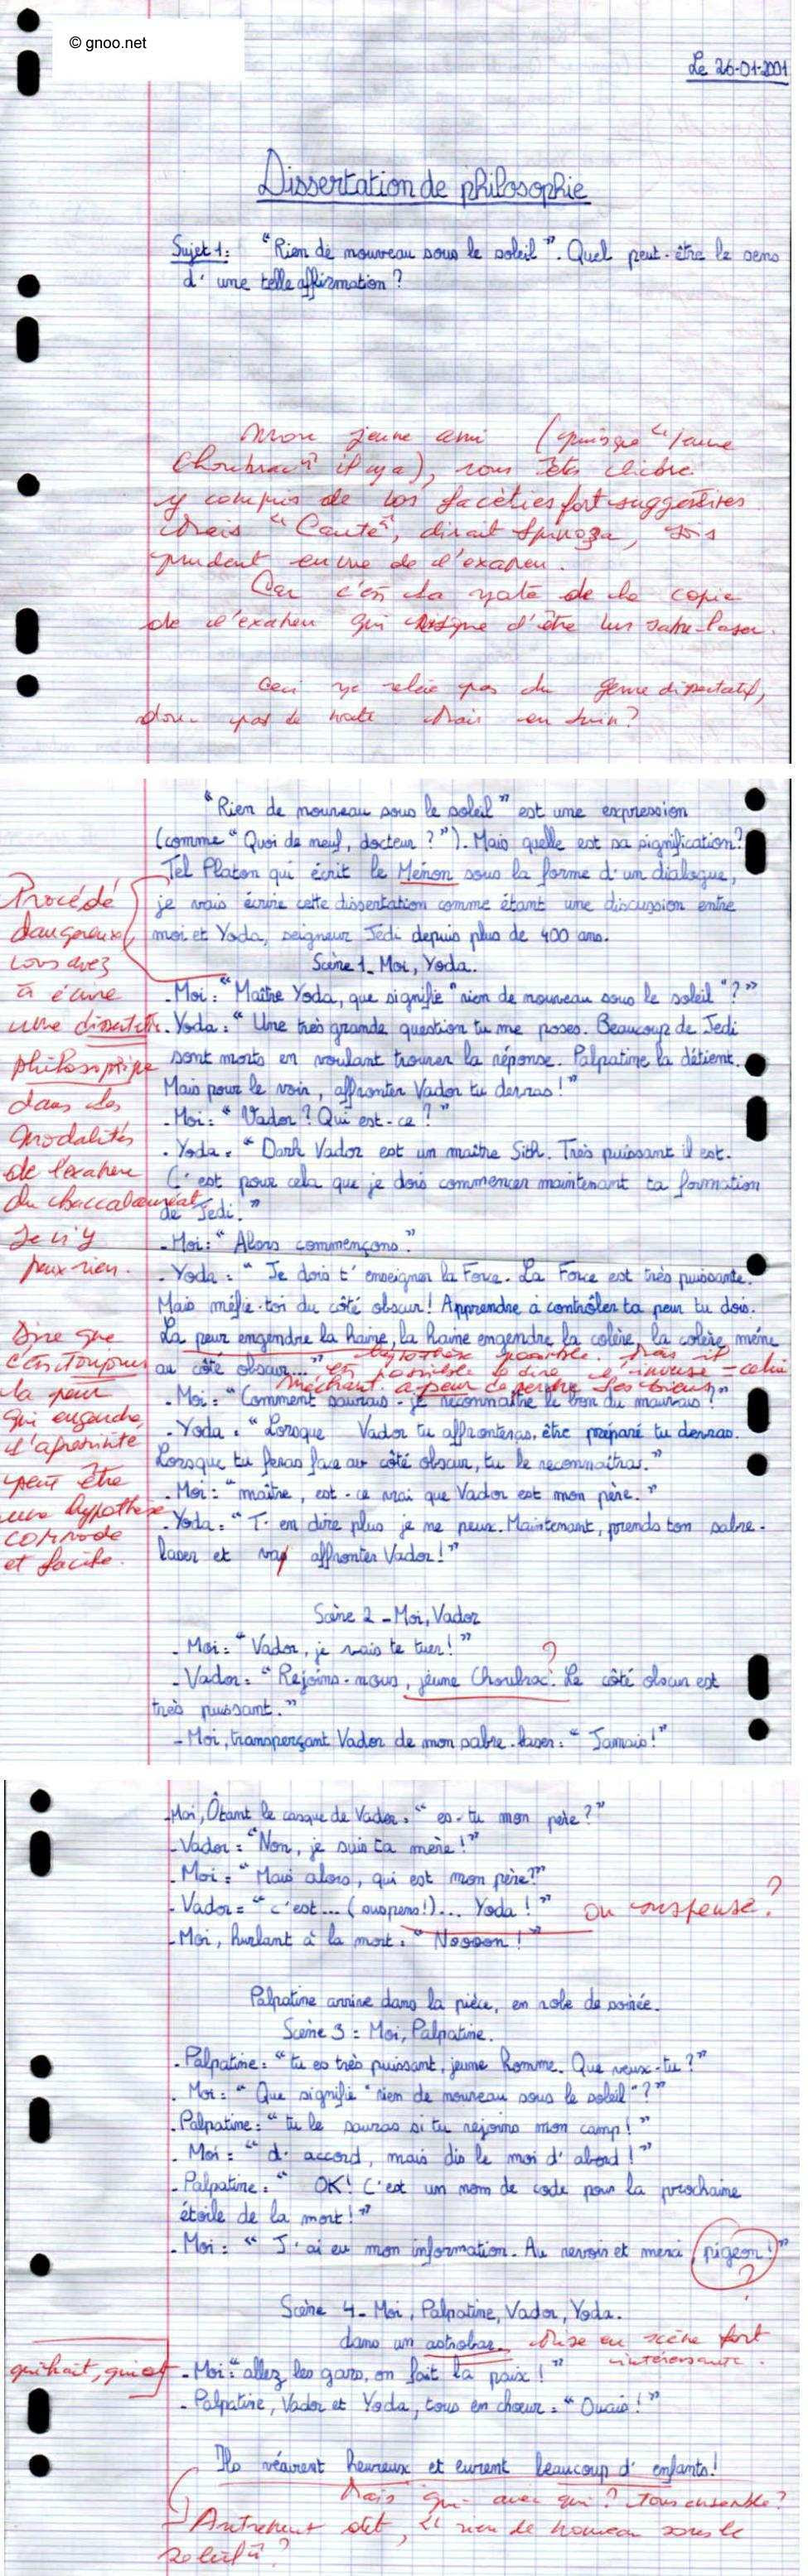 Pollution essay in english 1000 words senior prom essays